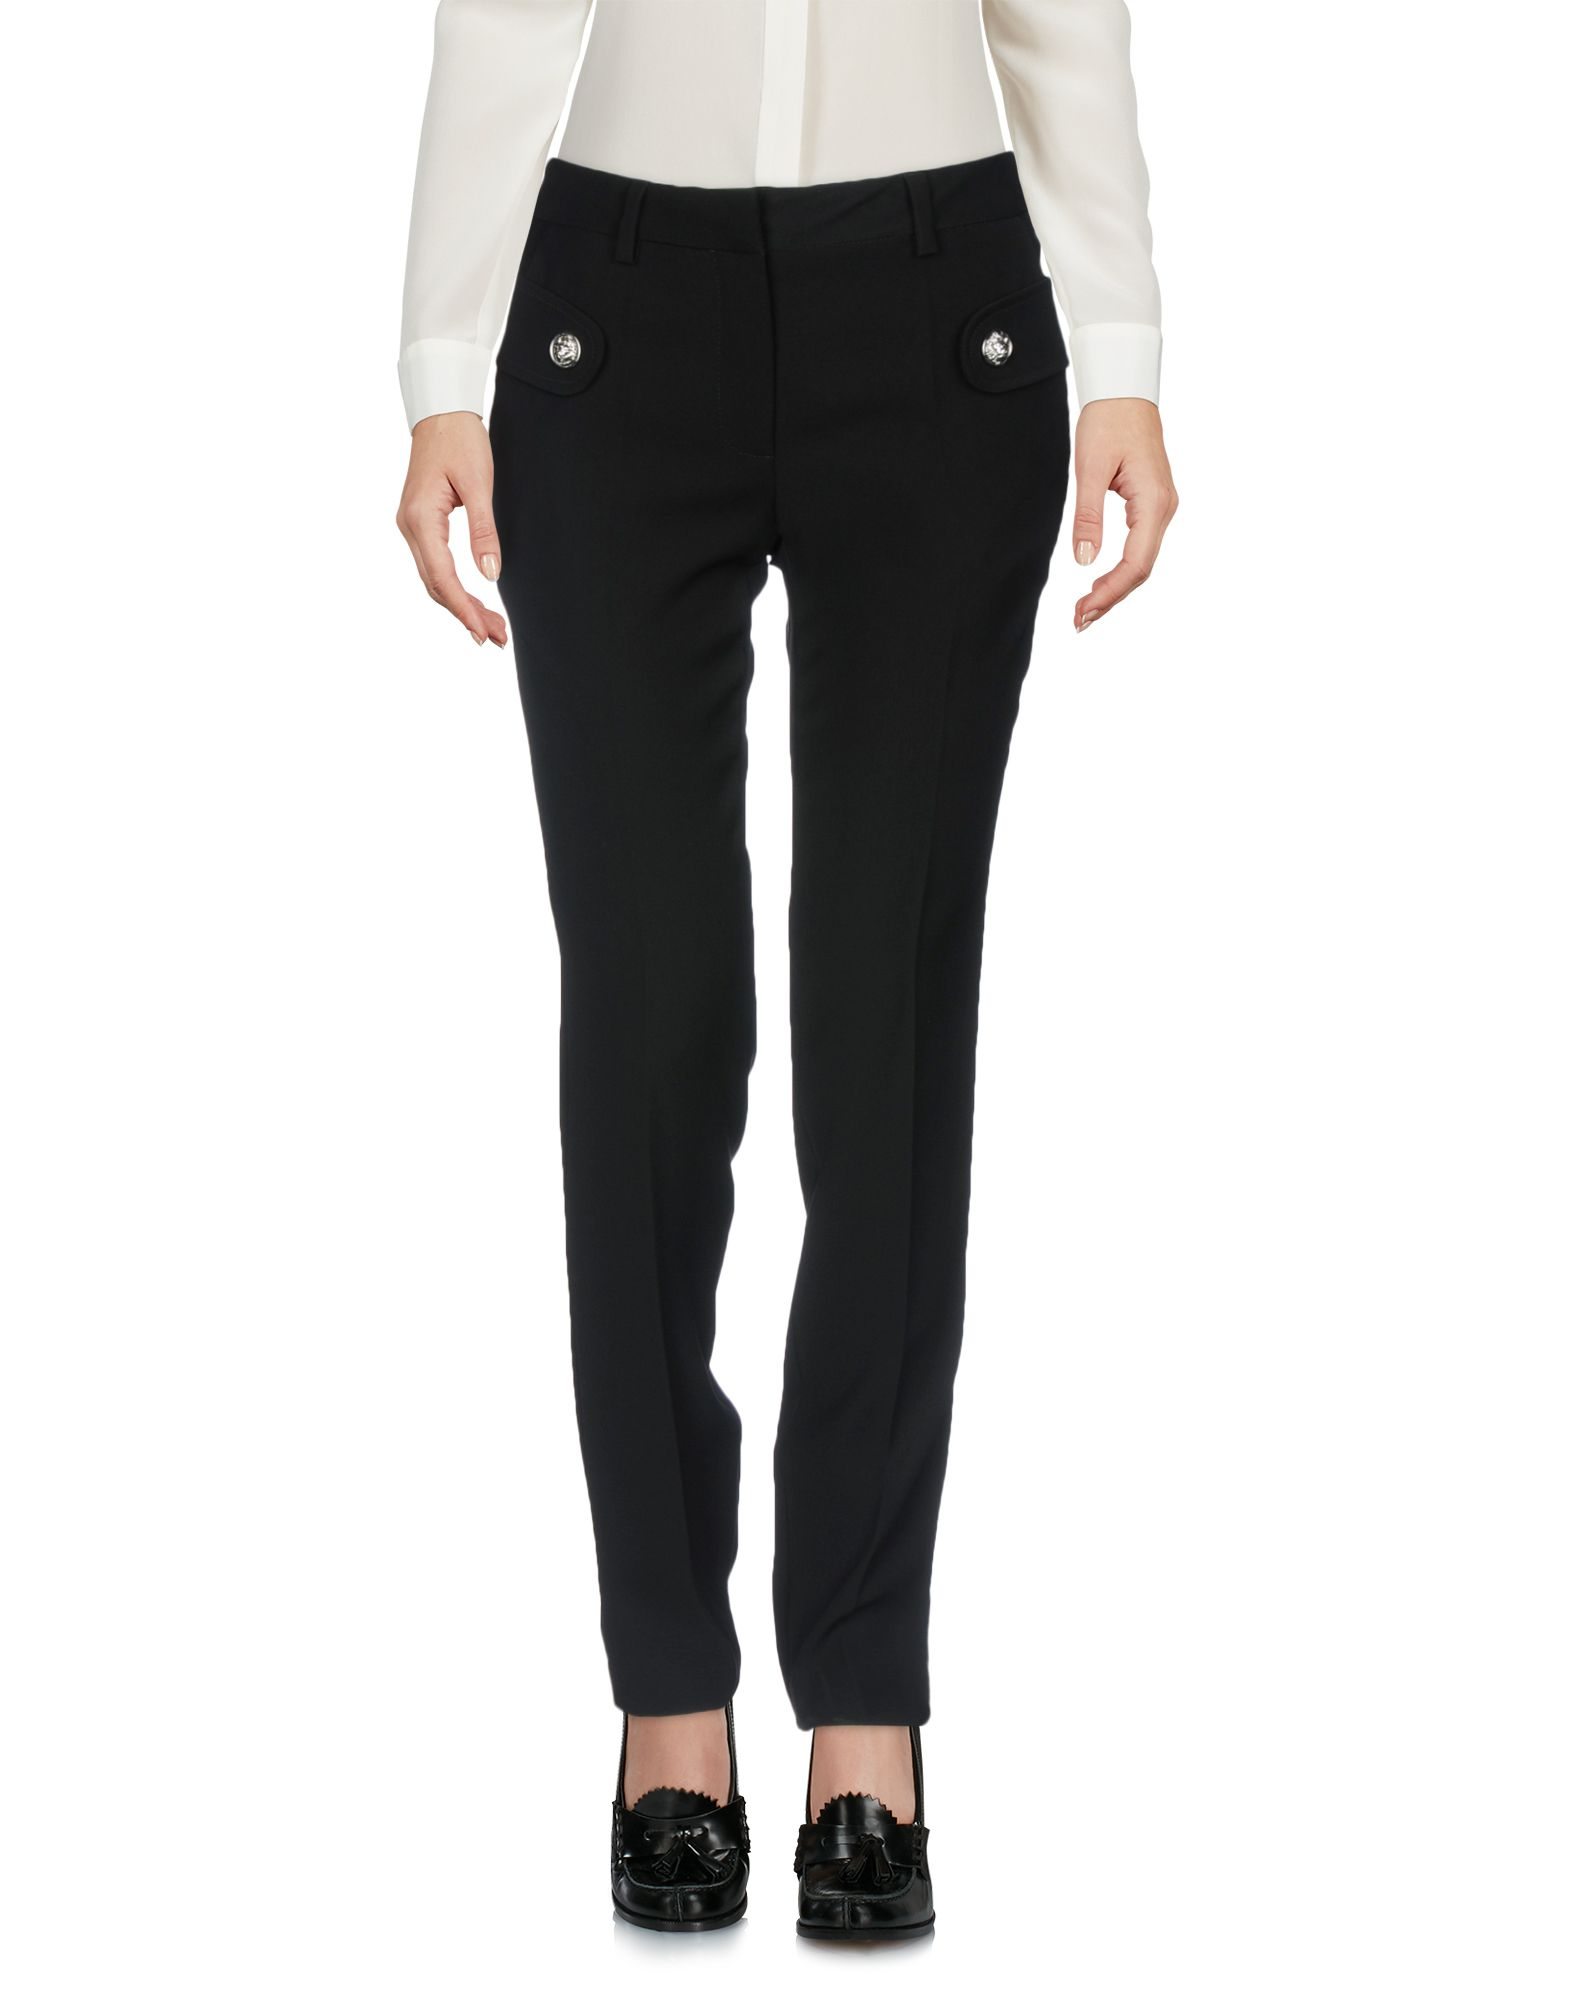 Pantalone Versus Versace Donna - Acquista online su RVTl7zOqI